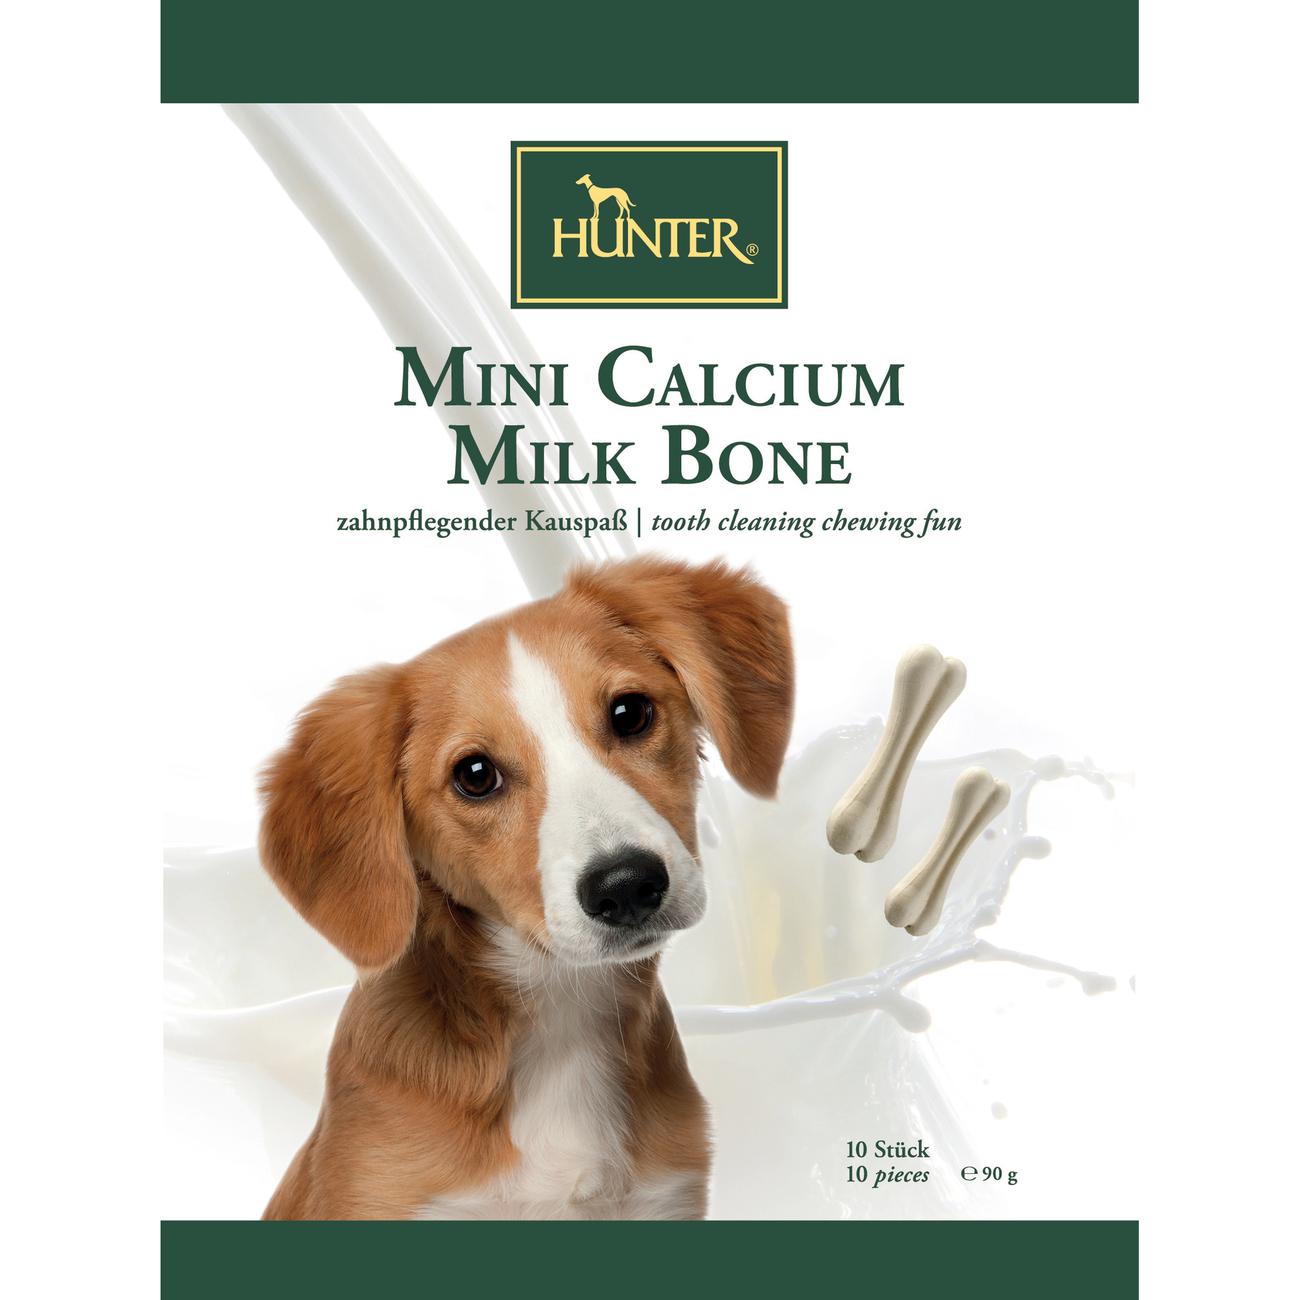 Hunter Hundesnack Mini Calcium Milk Bone für kleine Hunde 61037, Bild 2